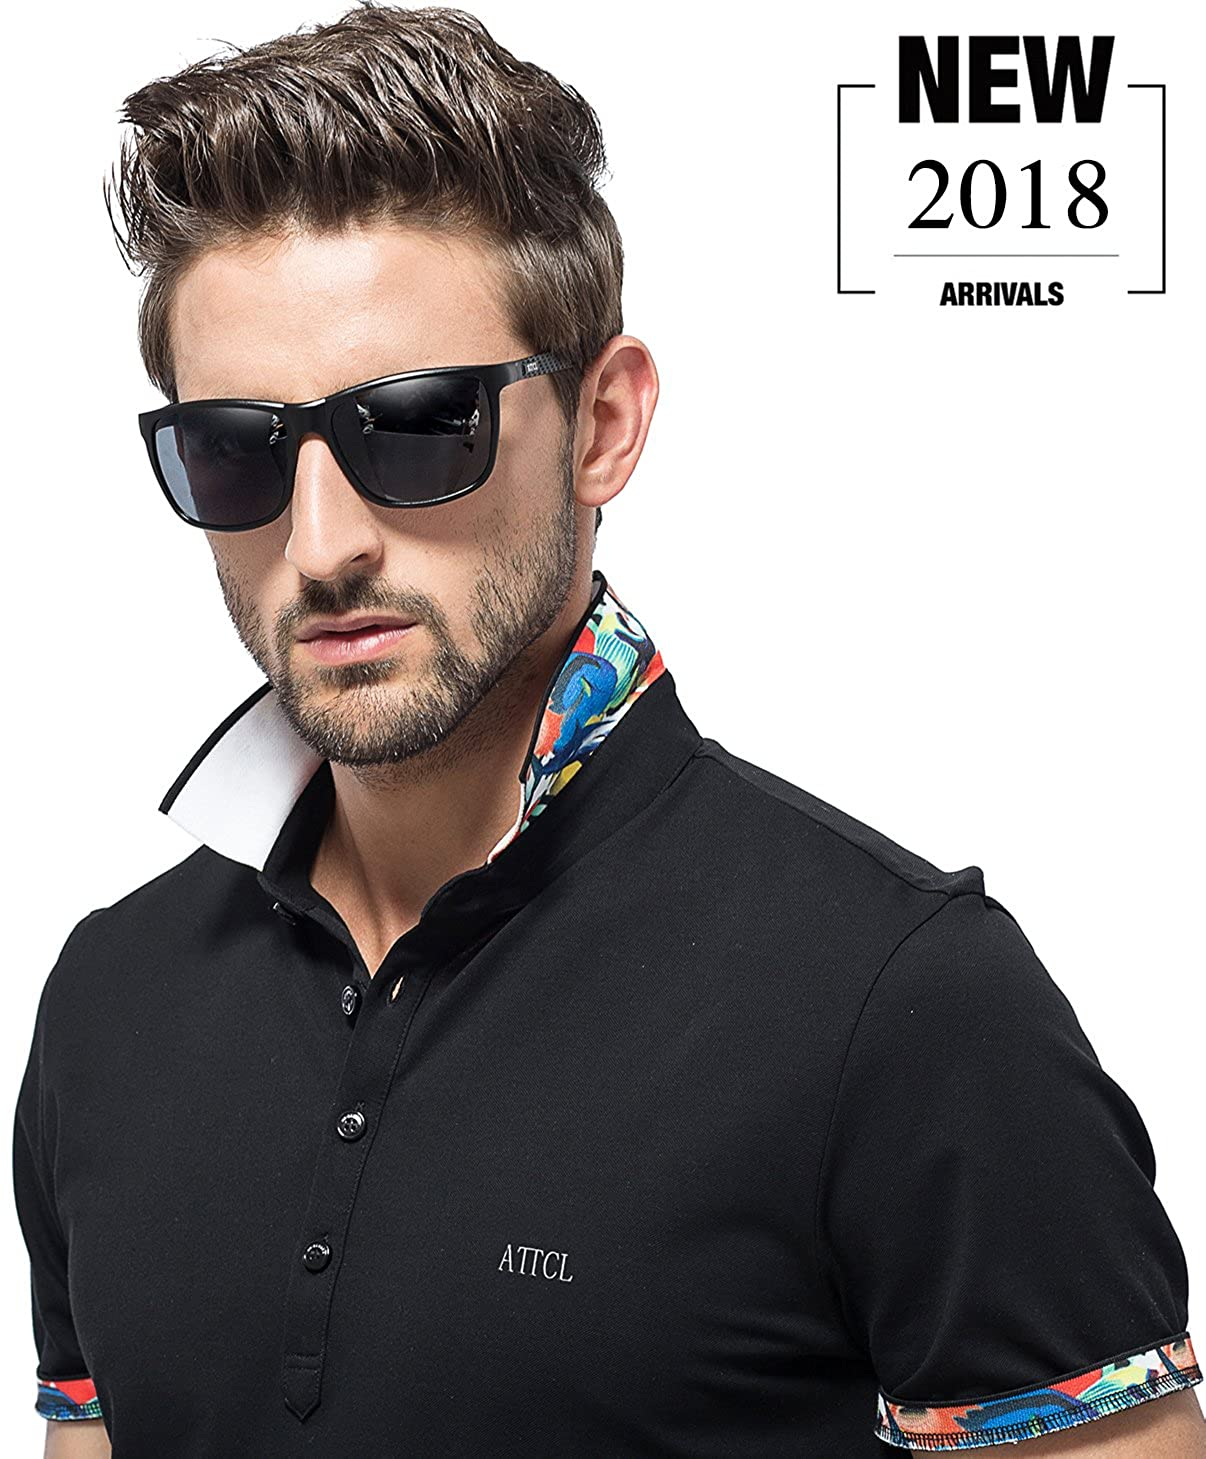 02e5a31f3d9c4 Amazon.com  ATTCL Men s Hot Retro Metal Frame Driving Polarized Wayfarer  Sunglasses For Men 18587black  Clothing